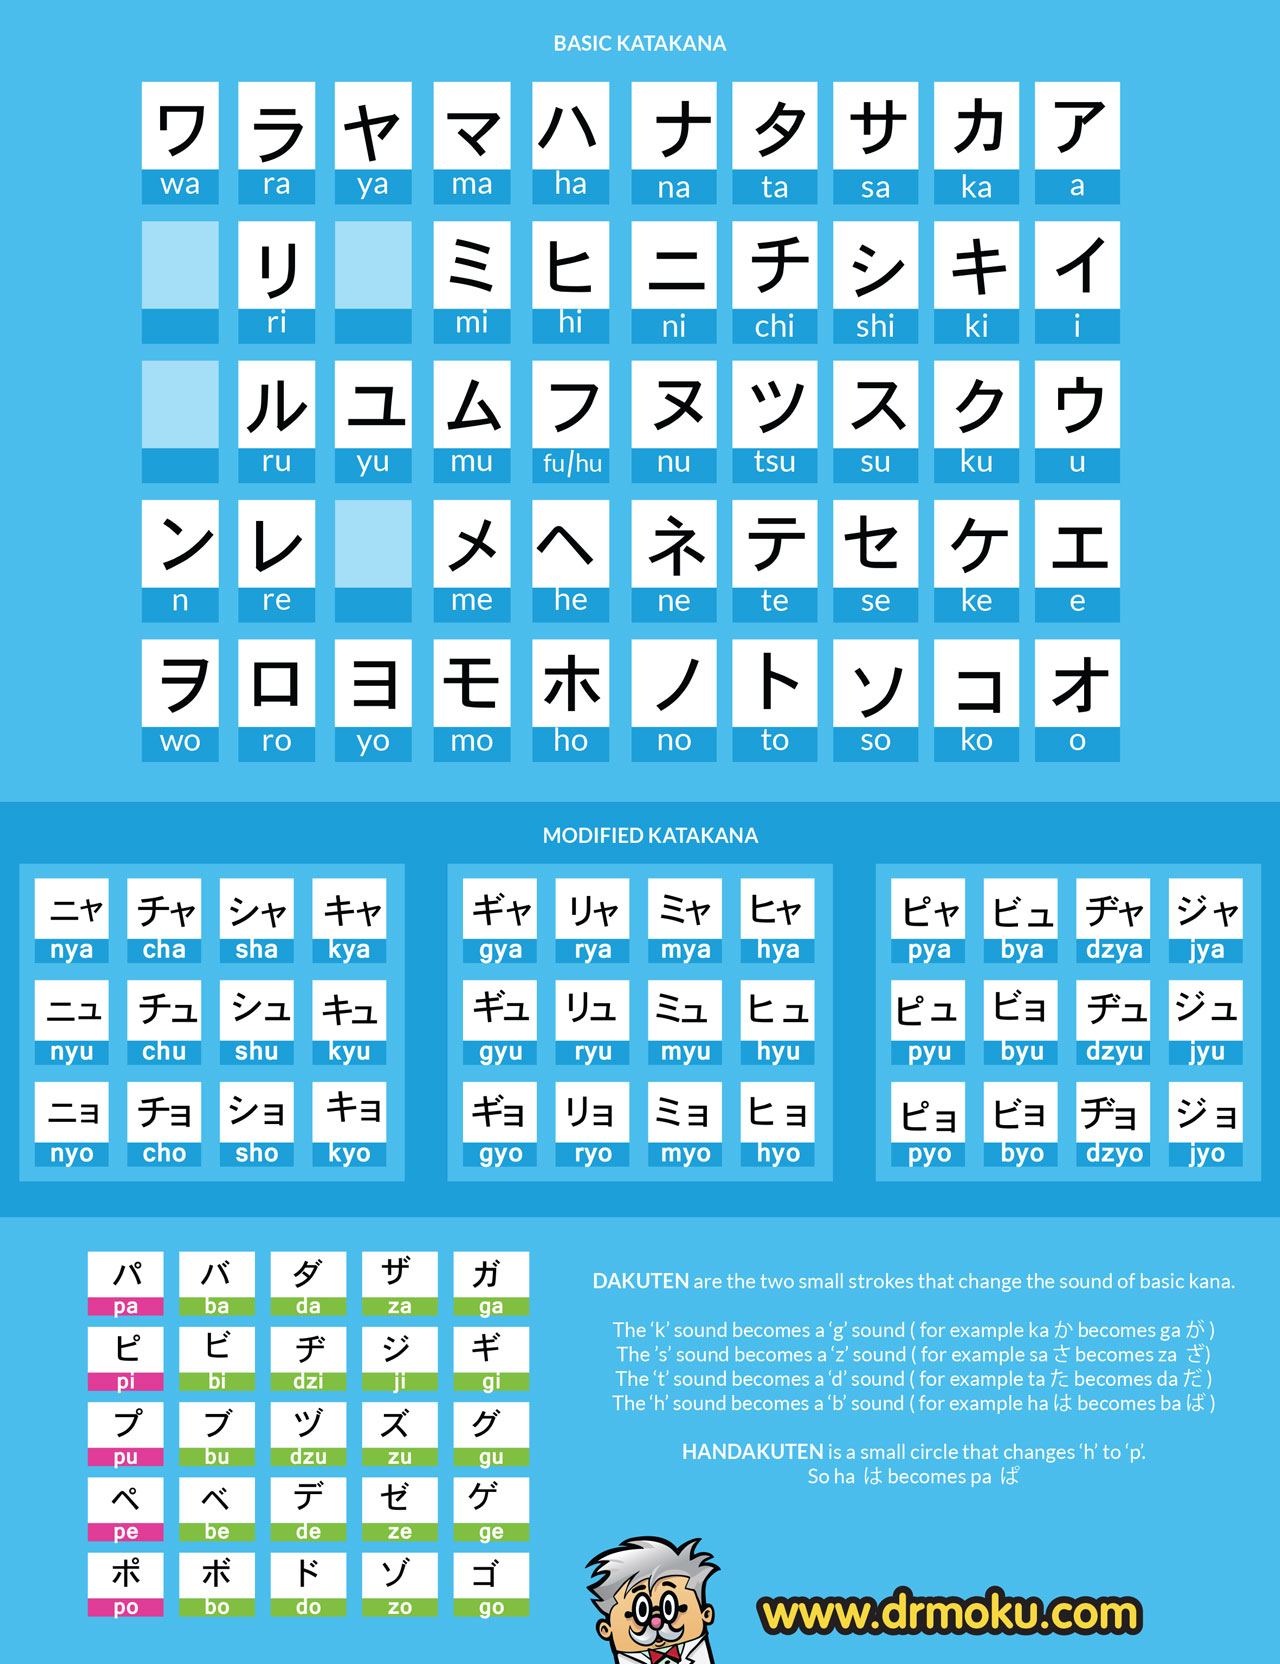 katakana chart by dr moku